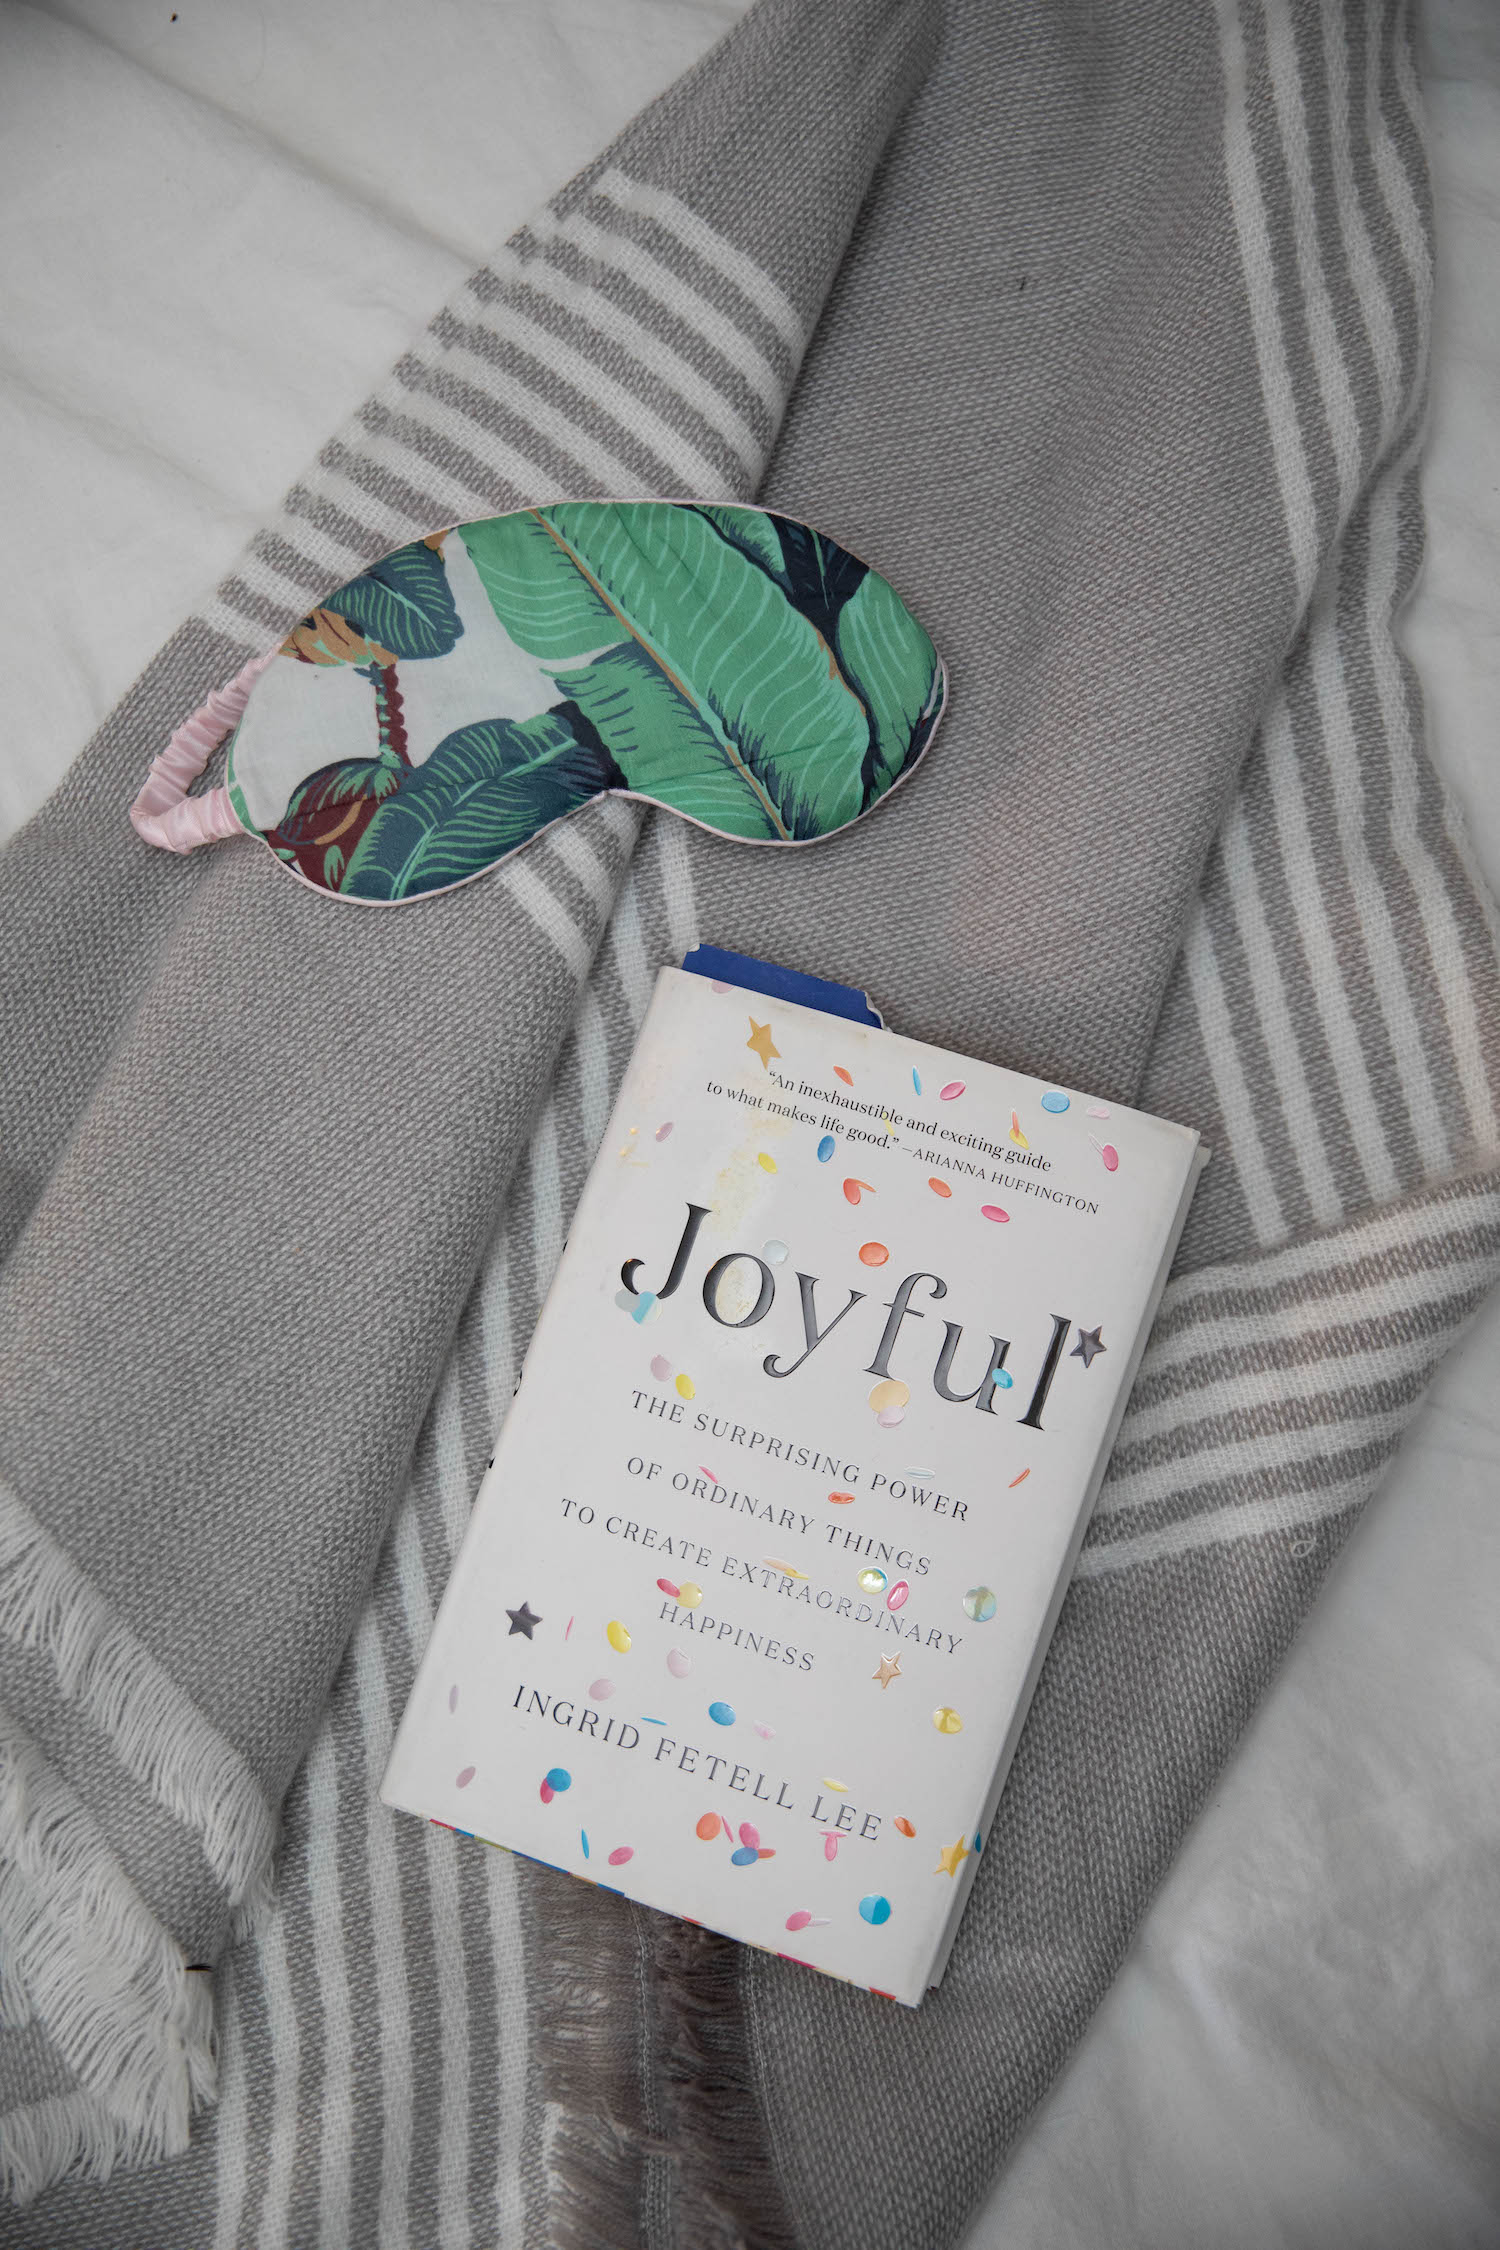 Joyful Book Review